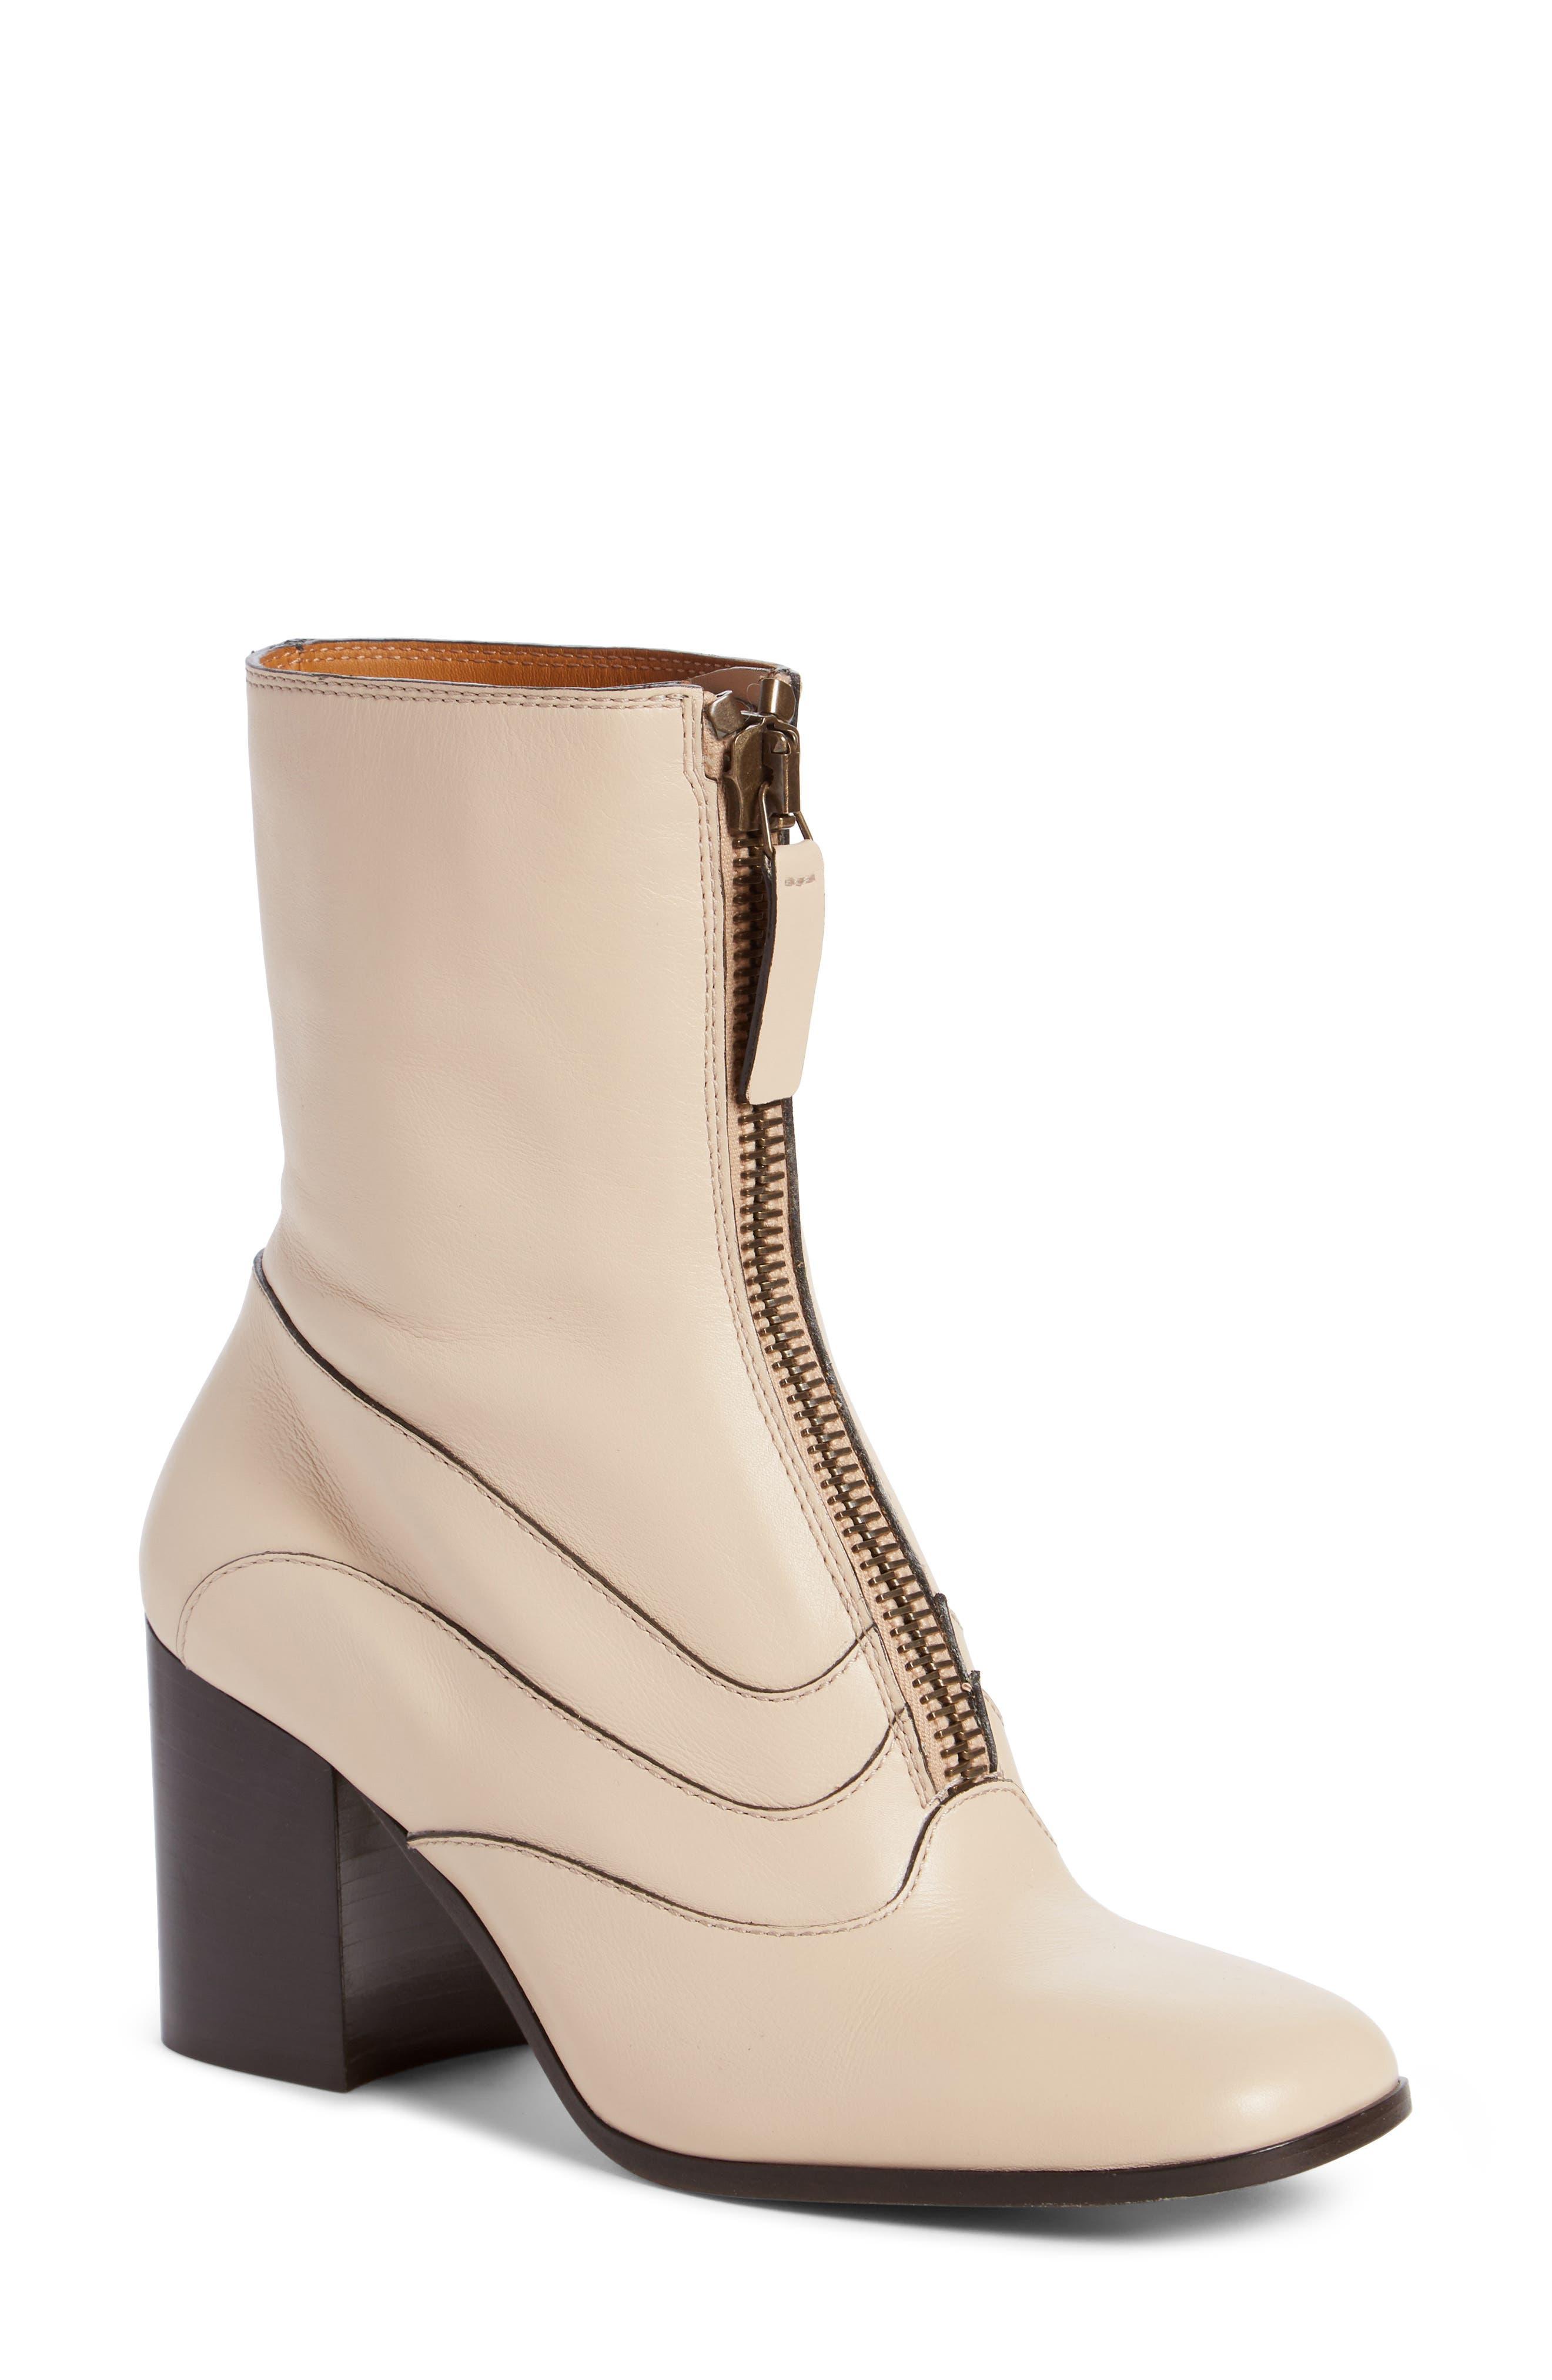 Main Image - Chloé Qacey Square Toe Boot (Women)